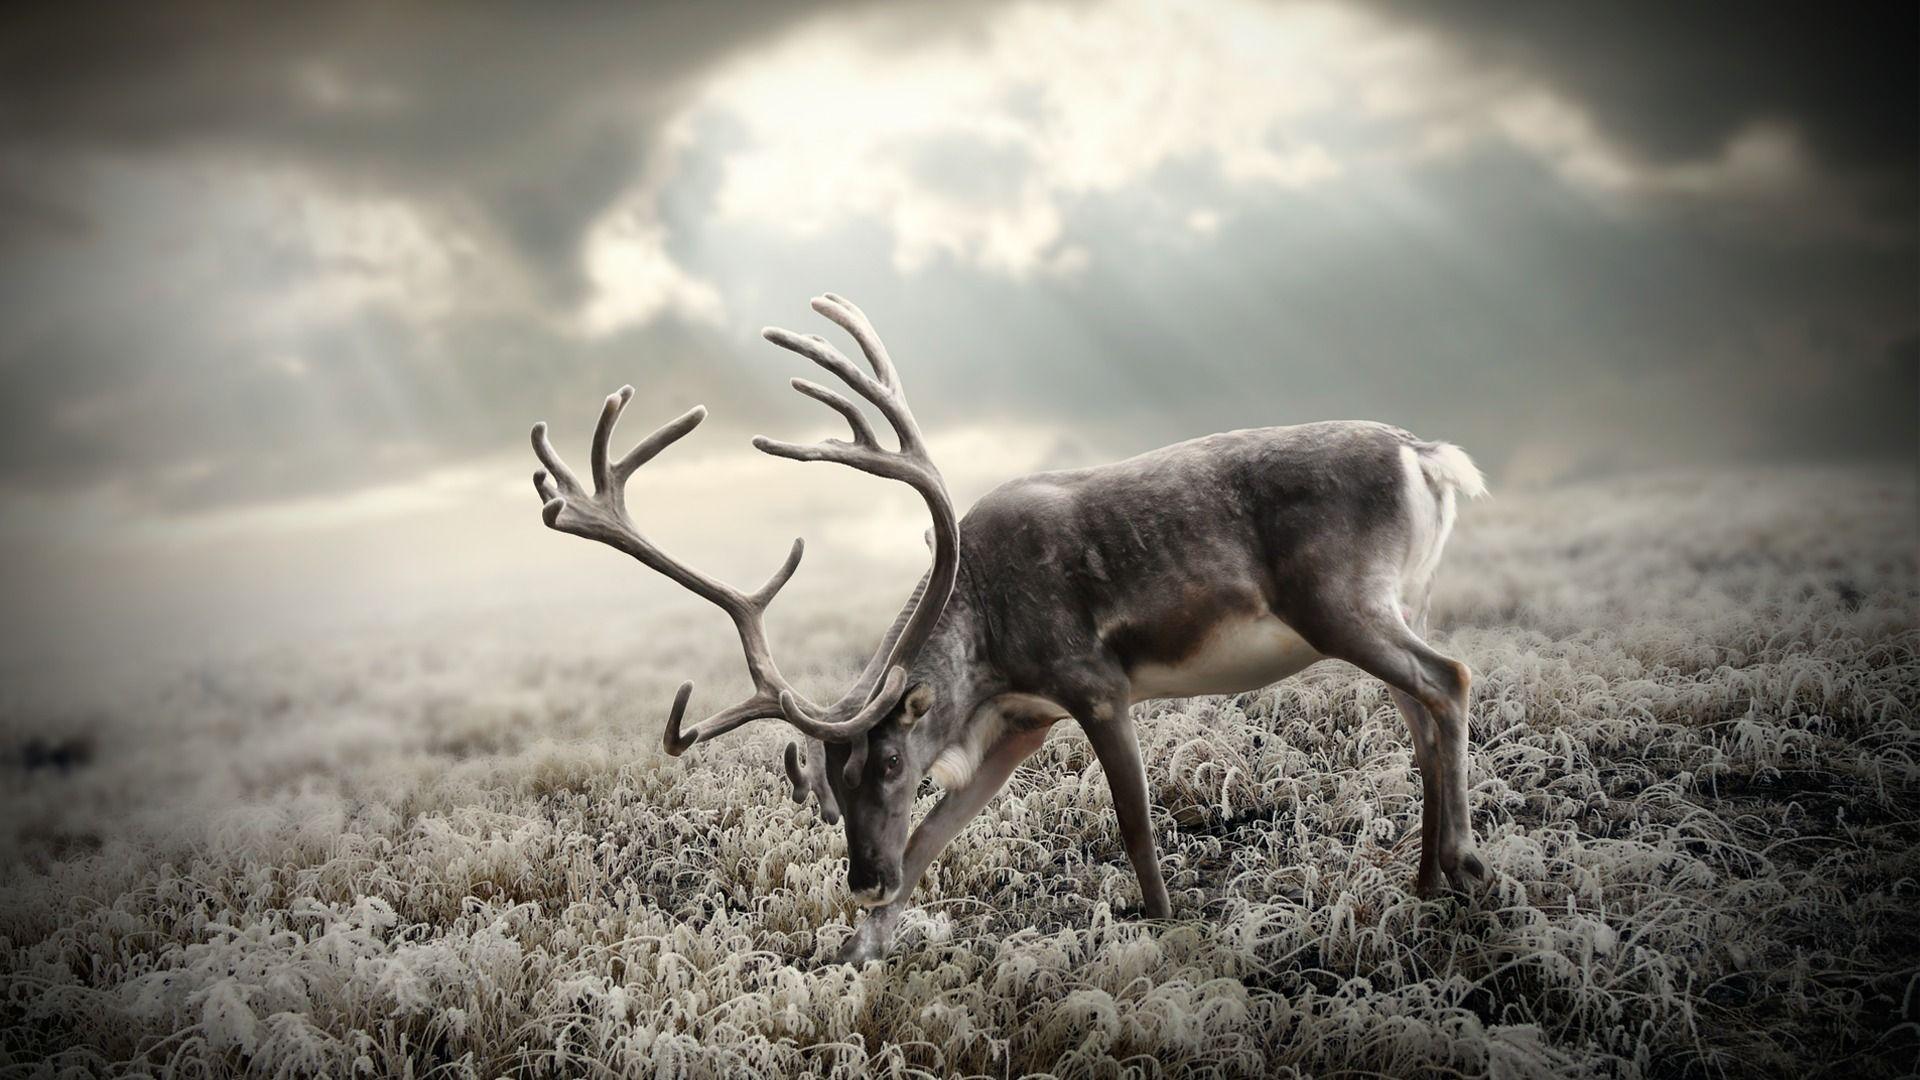 wallpapers of deers